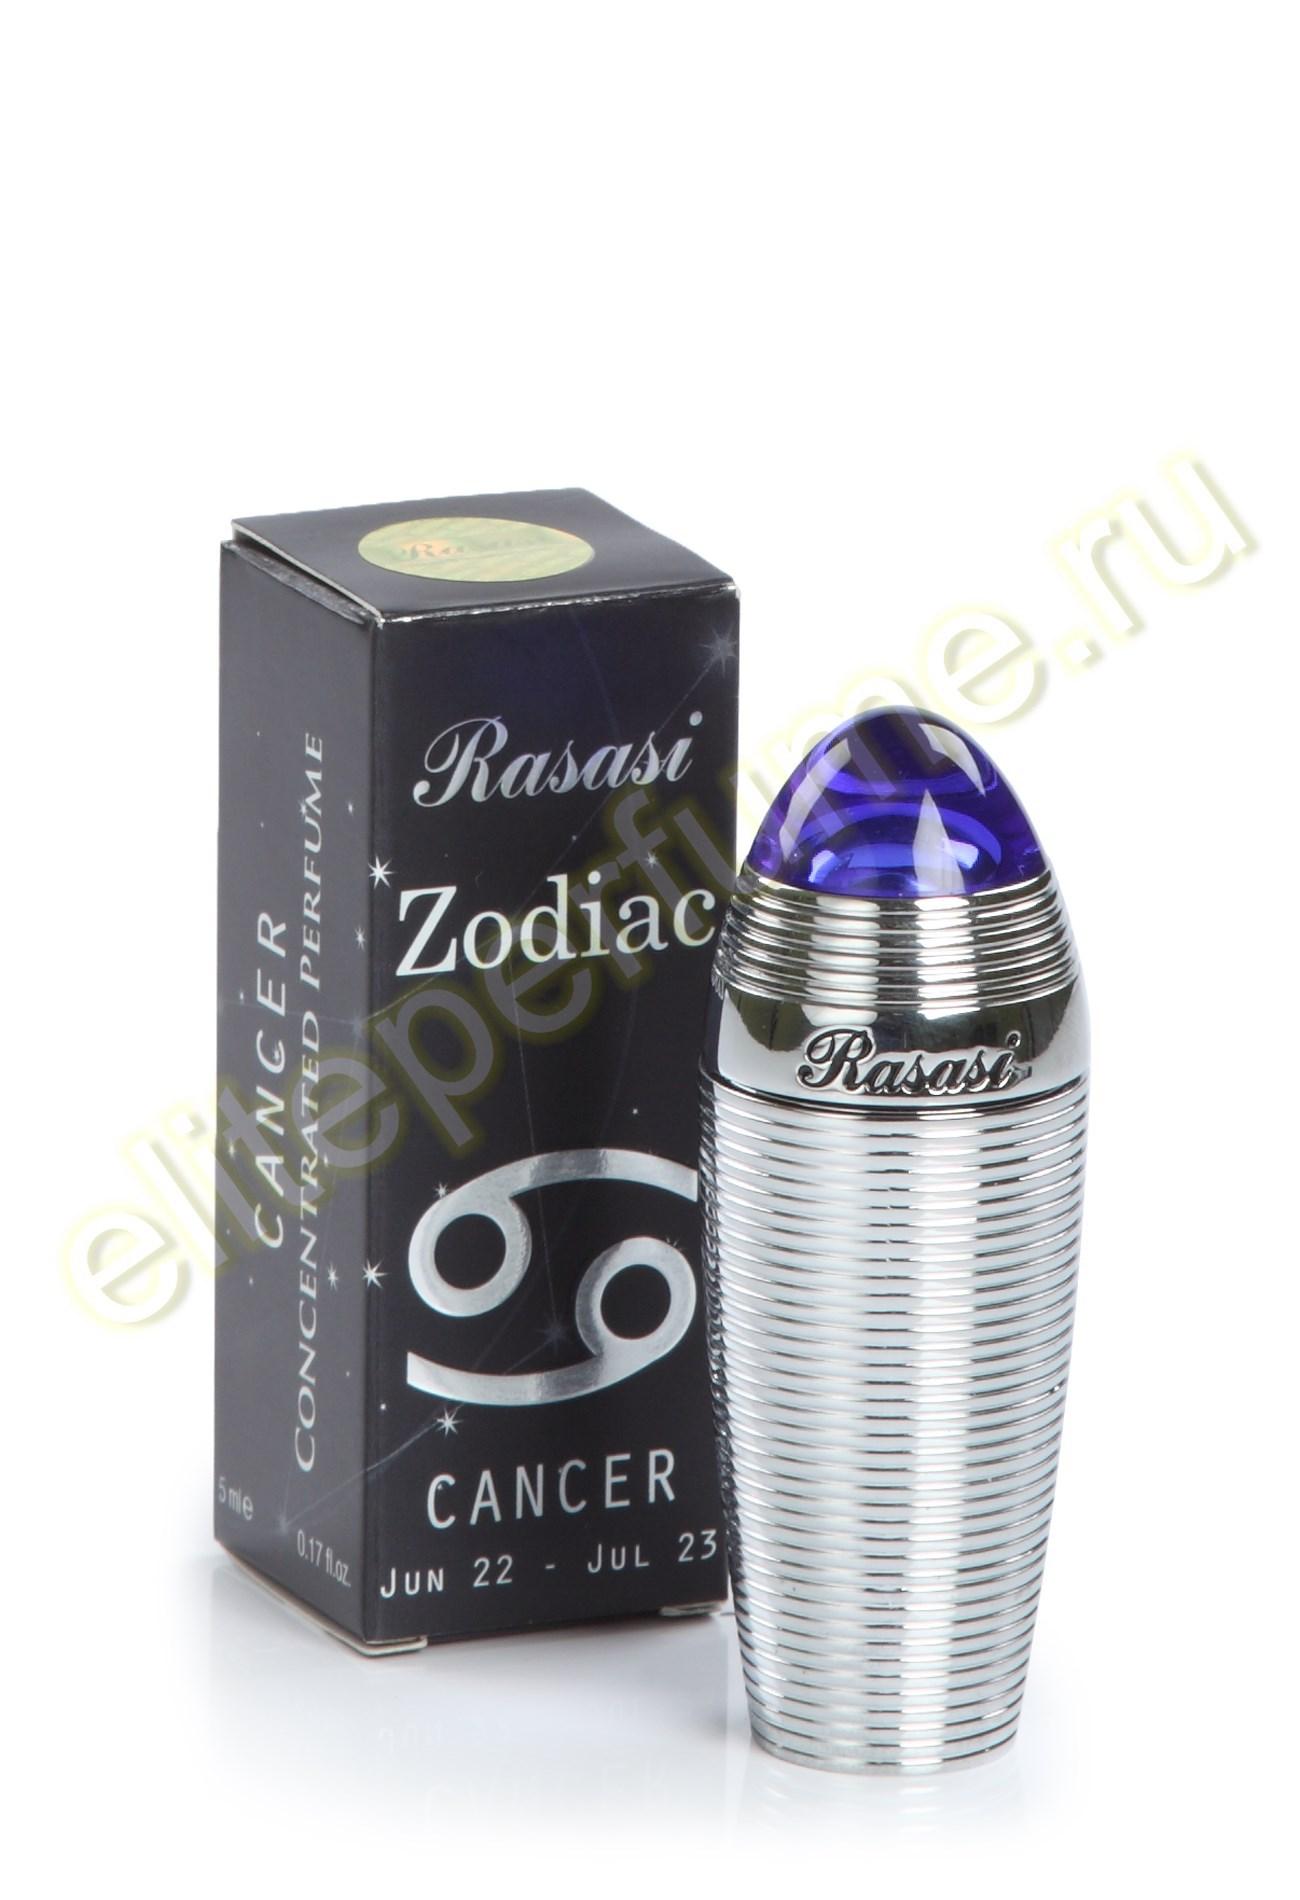 Зодиак Рак Zodiac Cancer 5 мл арабские масляные духи от Расаси Rasasi Perfumes